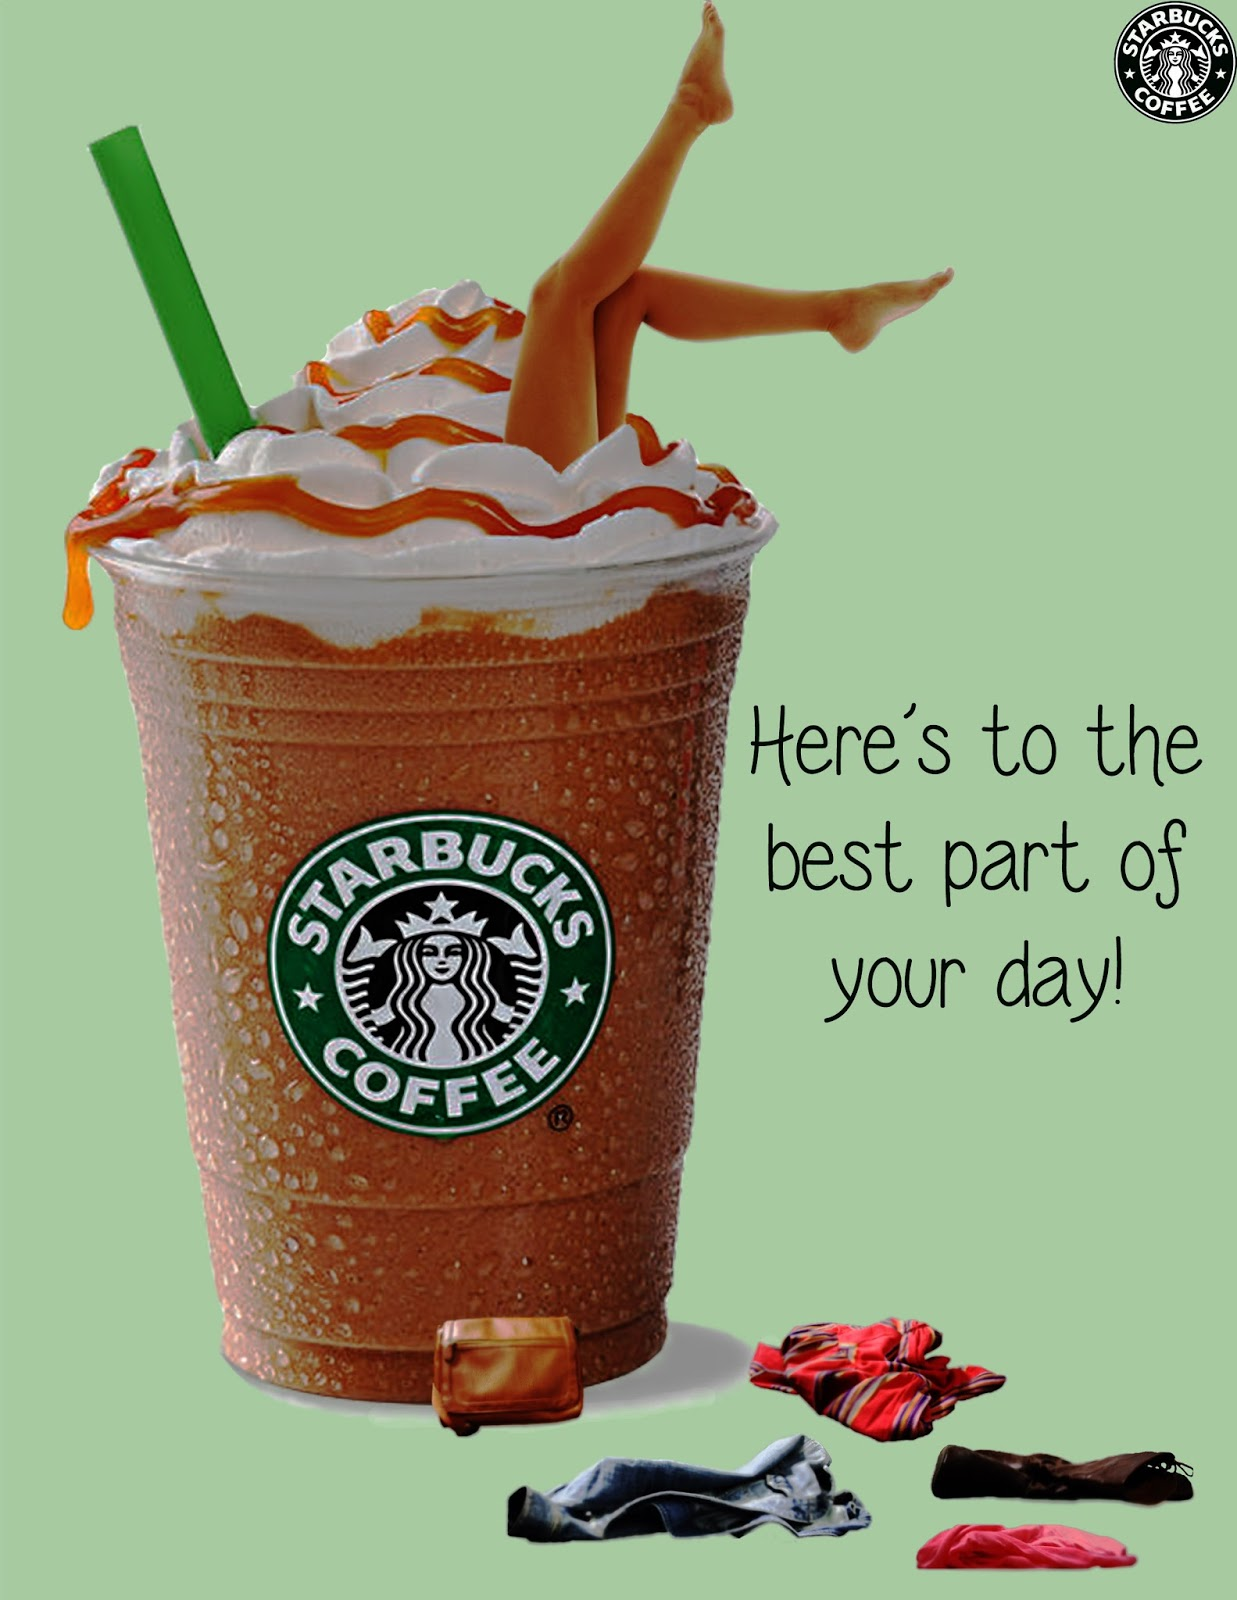 Starbucks marketing and sales department